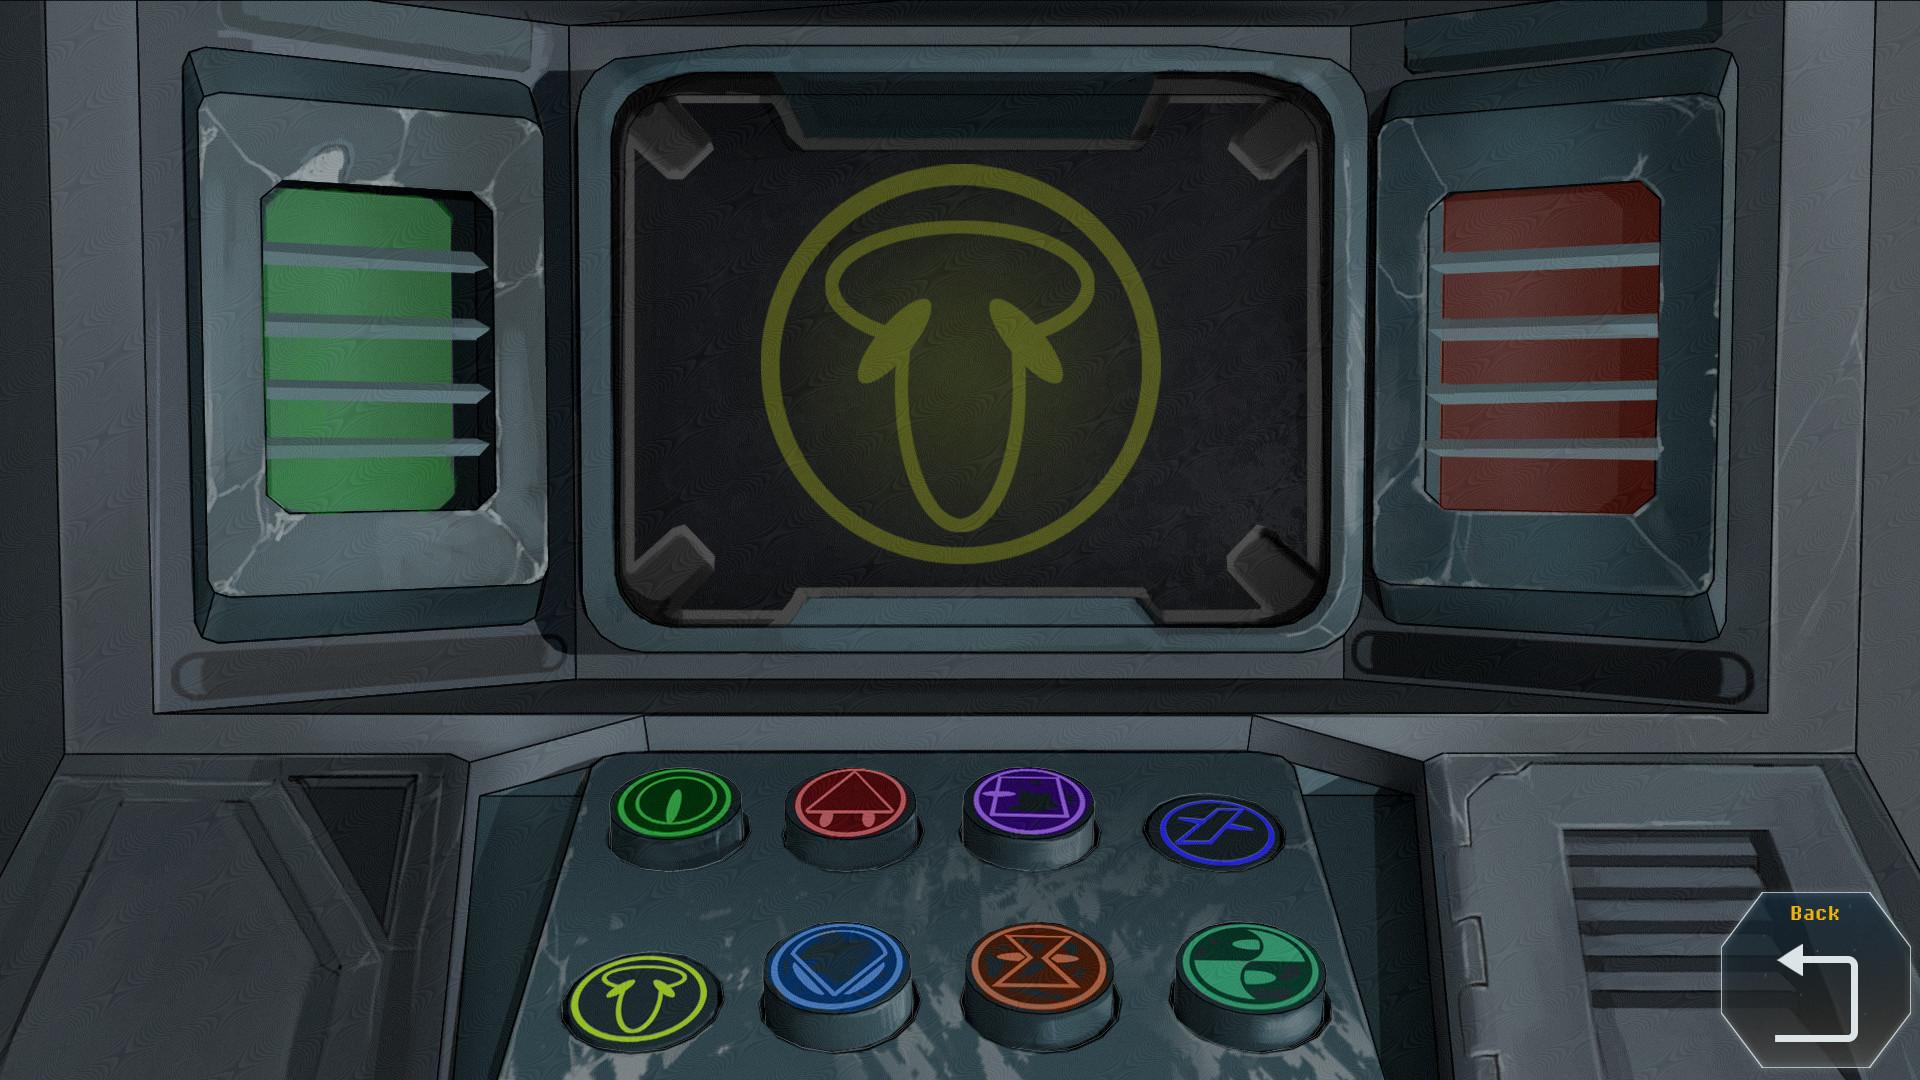 Kasper ahlstedt screenshot minigame